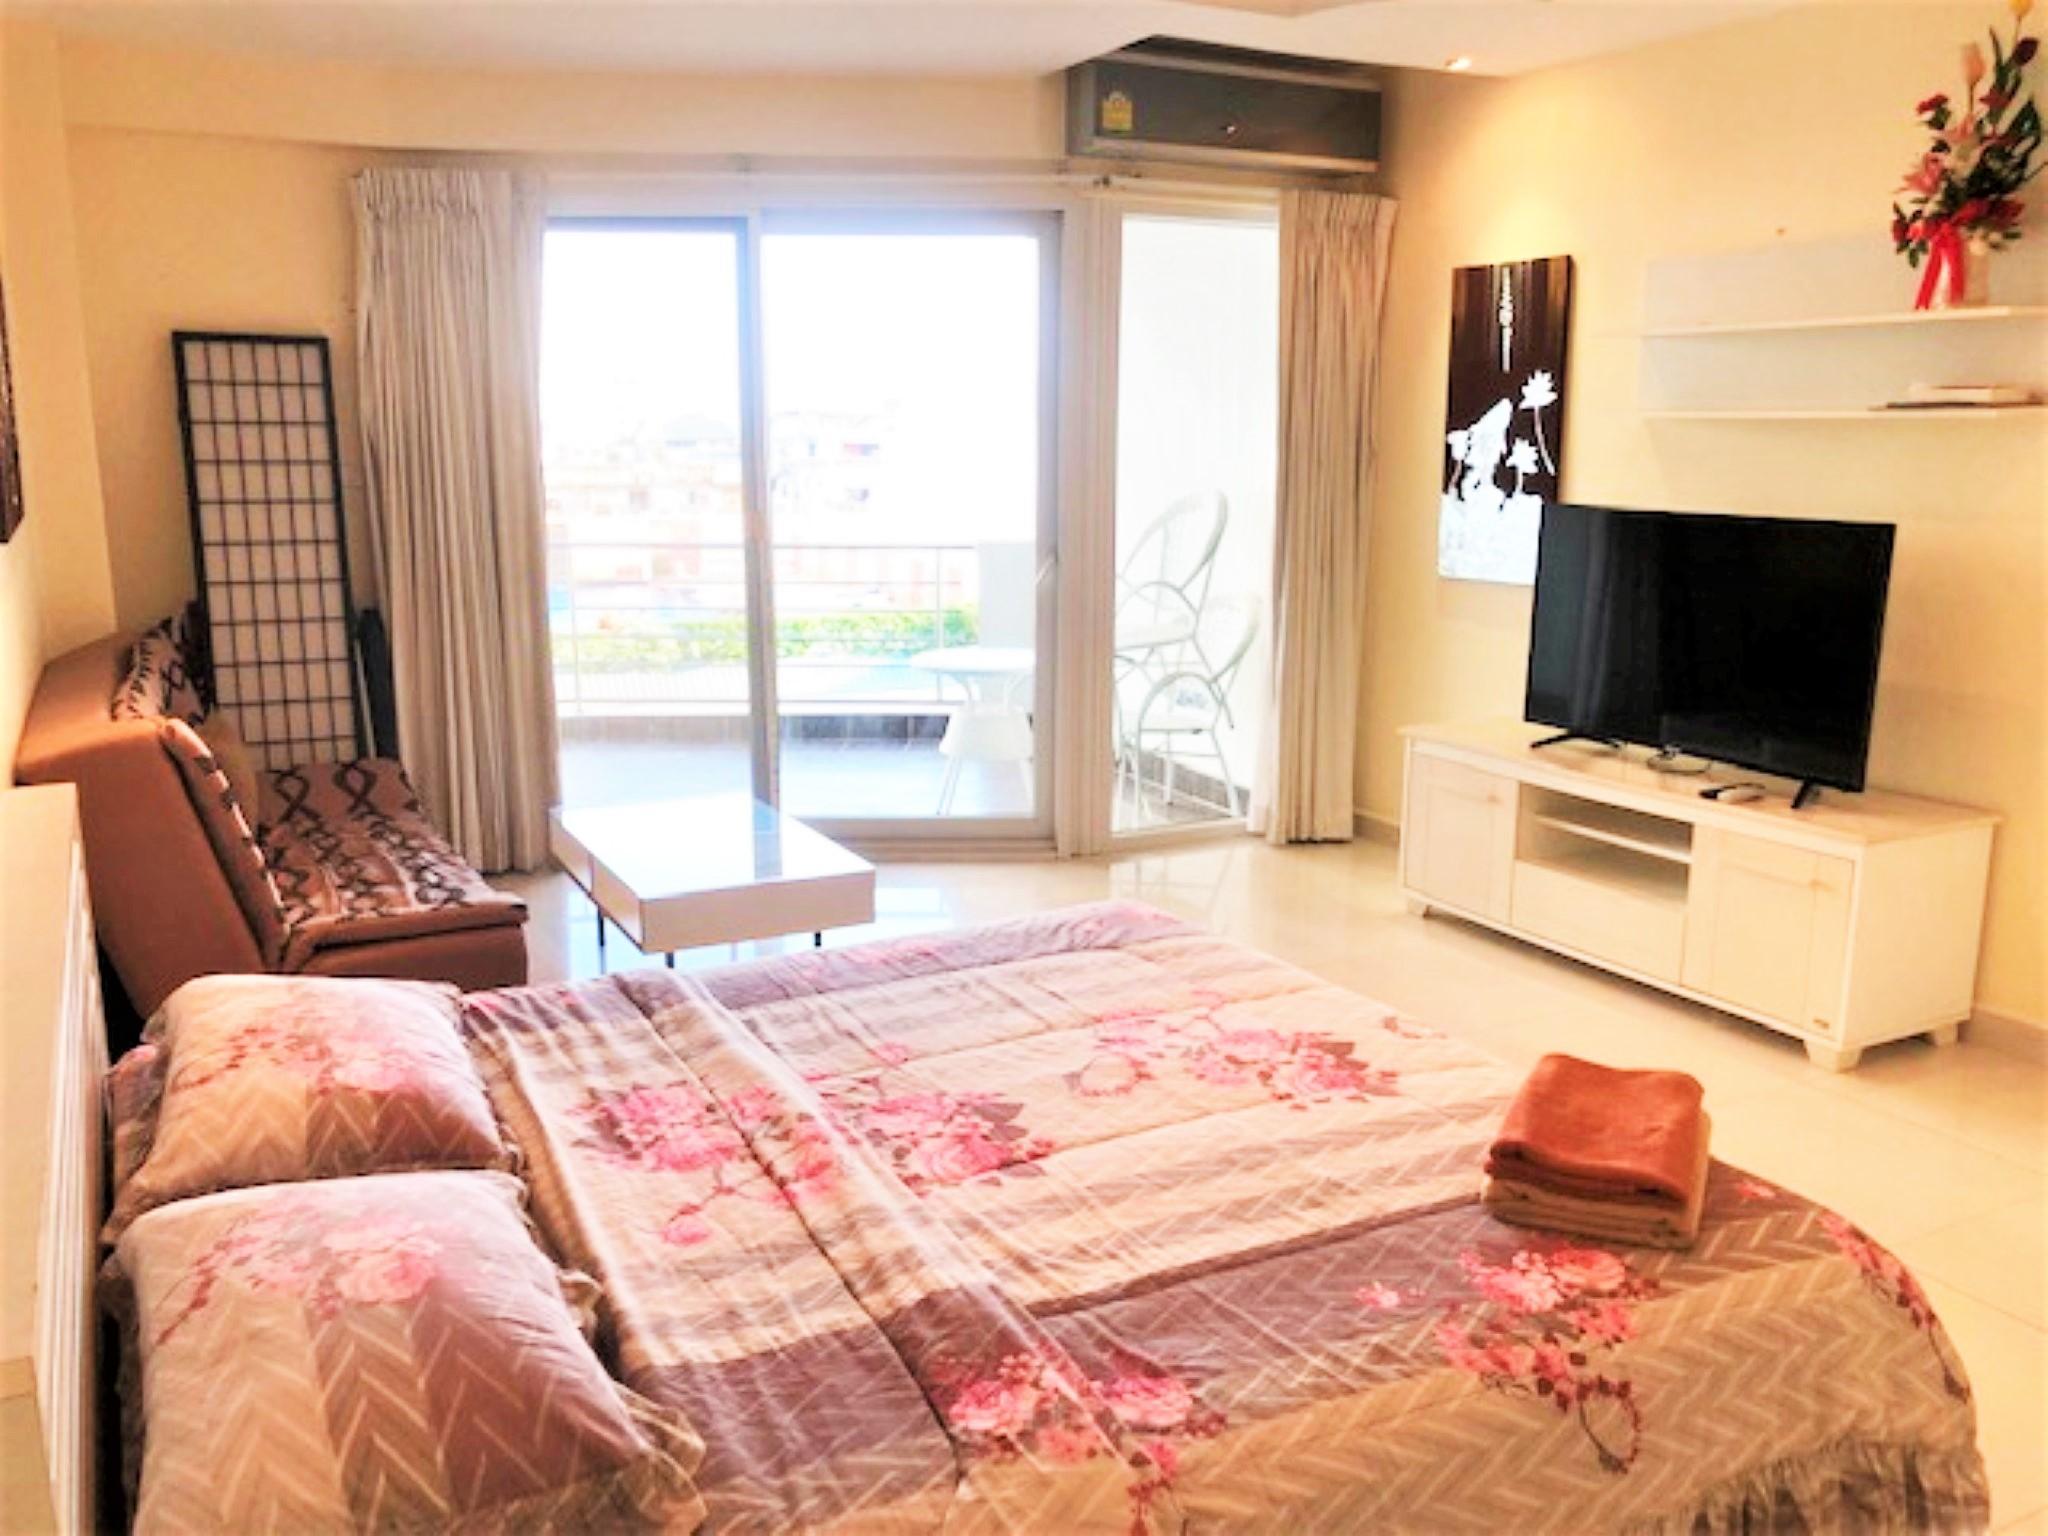 Jomtien Plaza Residence Sea View Studio Apartment